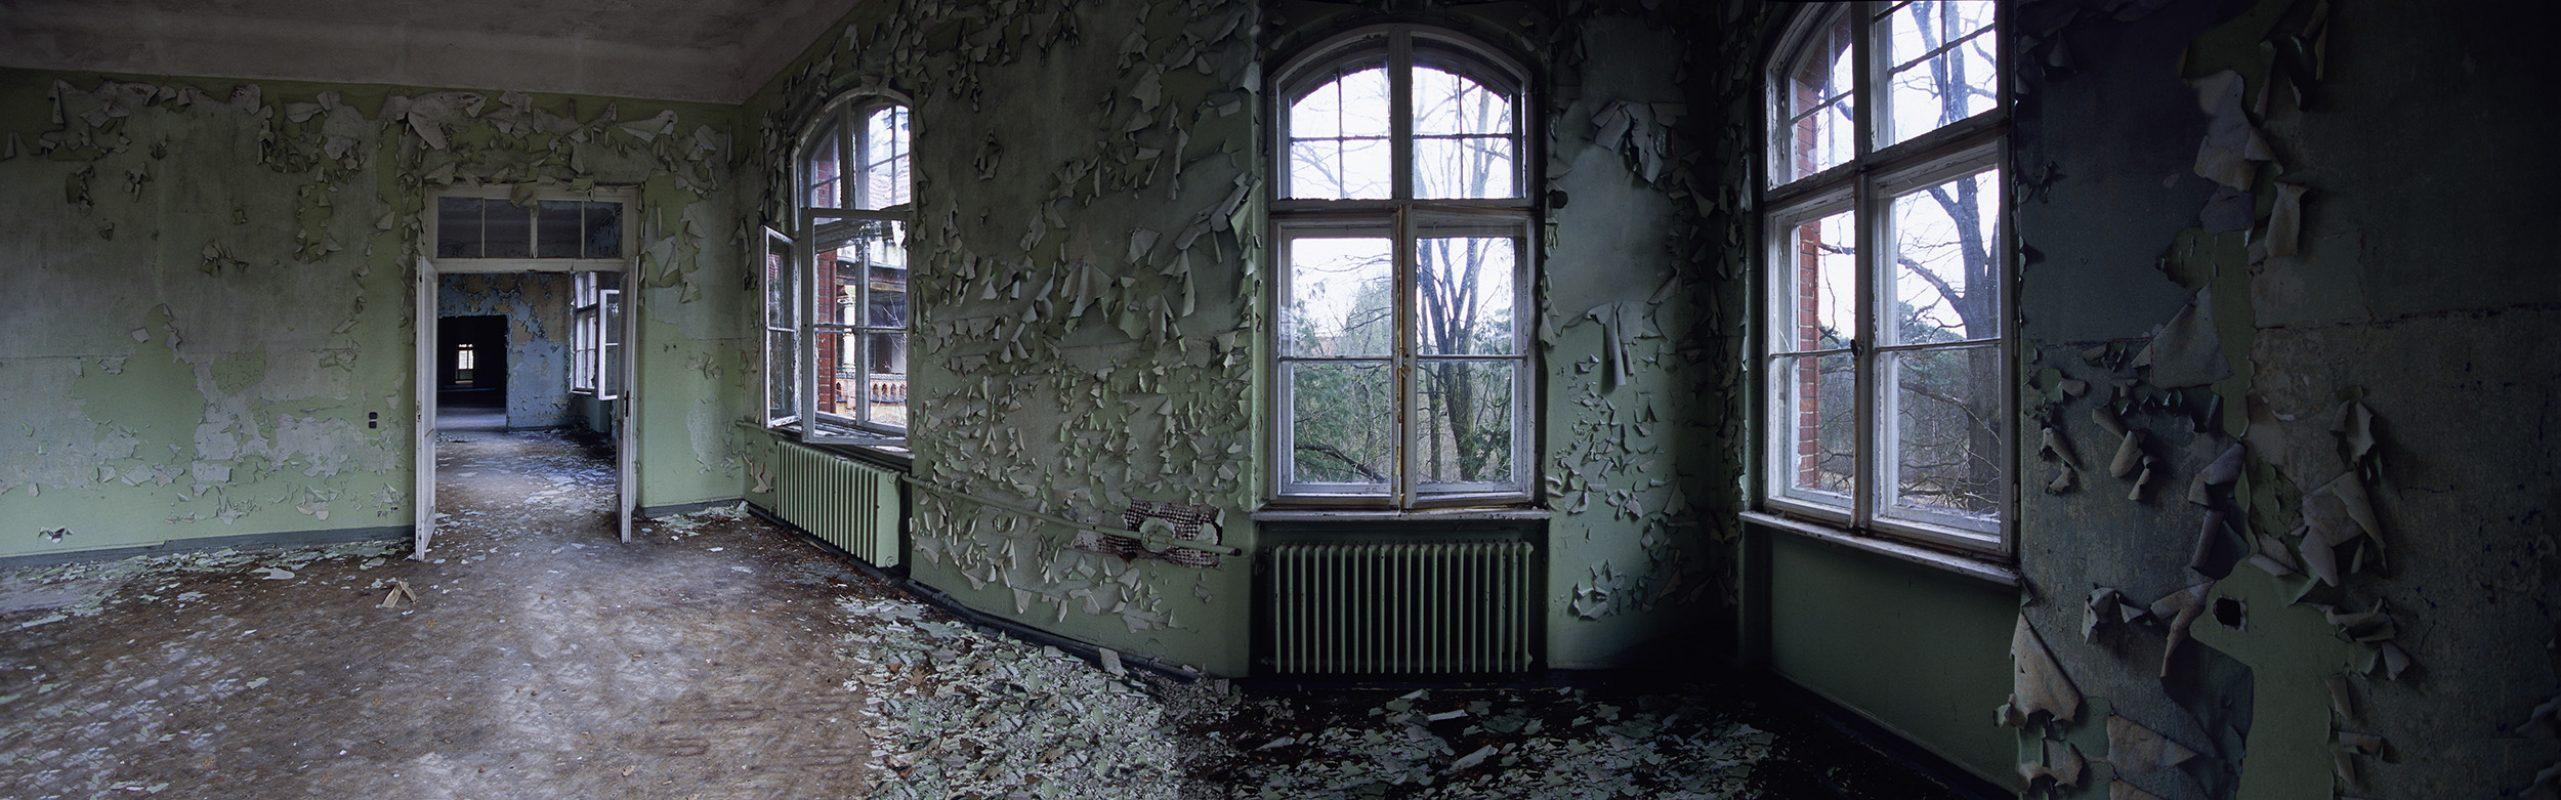 Beelitz-Heilstätten, grüner ausblick